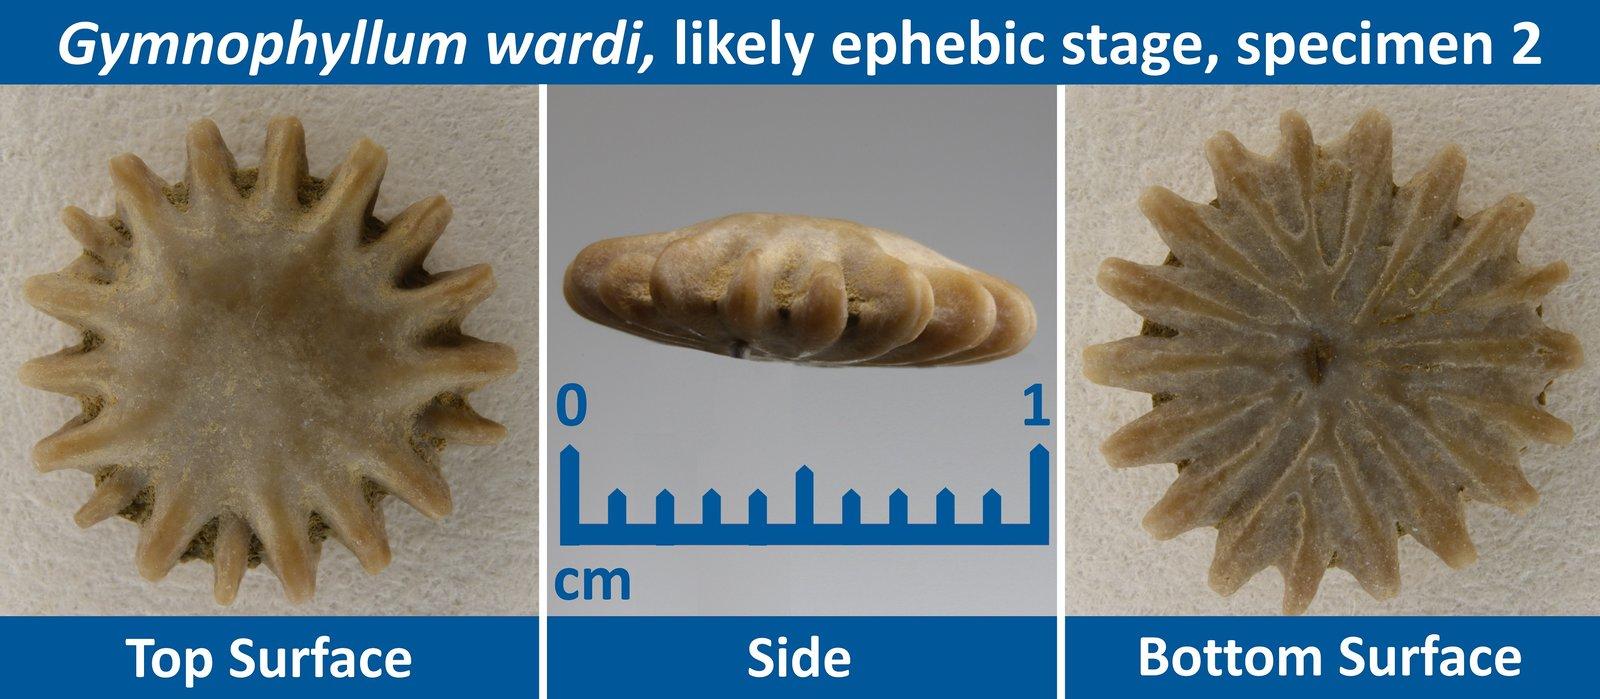 04 Gymnophyllum wardi Ephebic Specimen 02.jpg